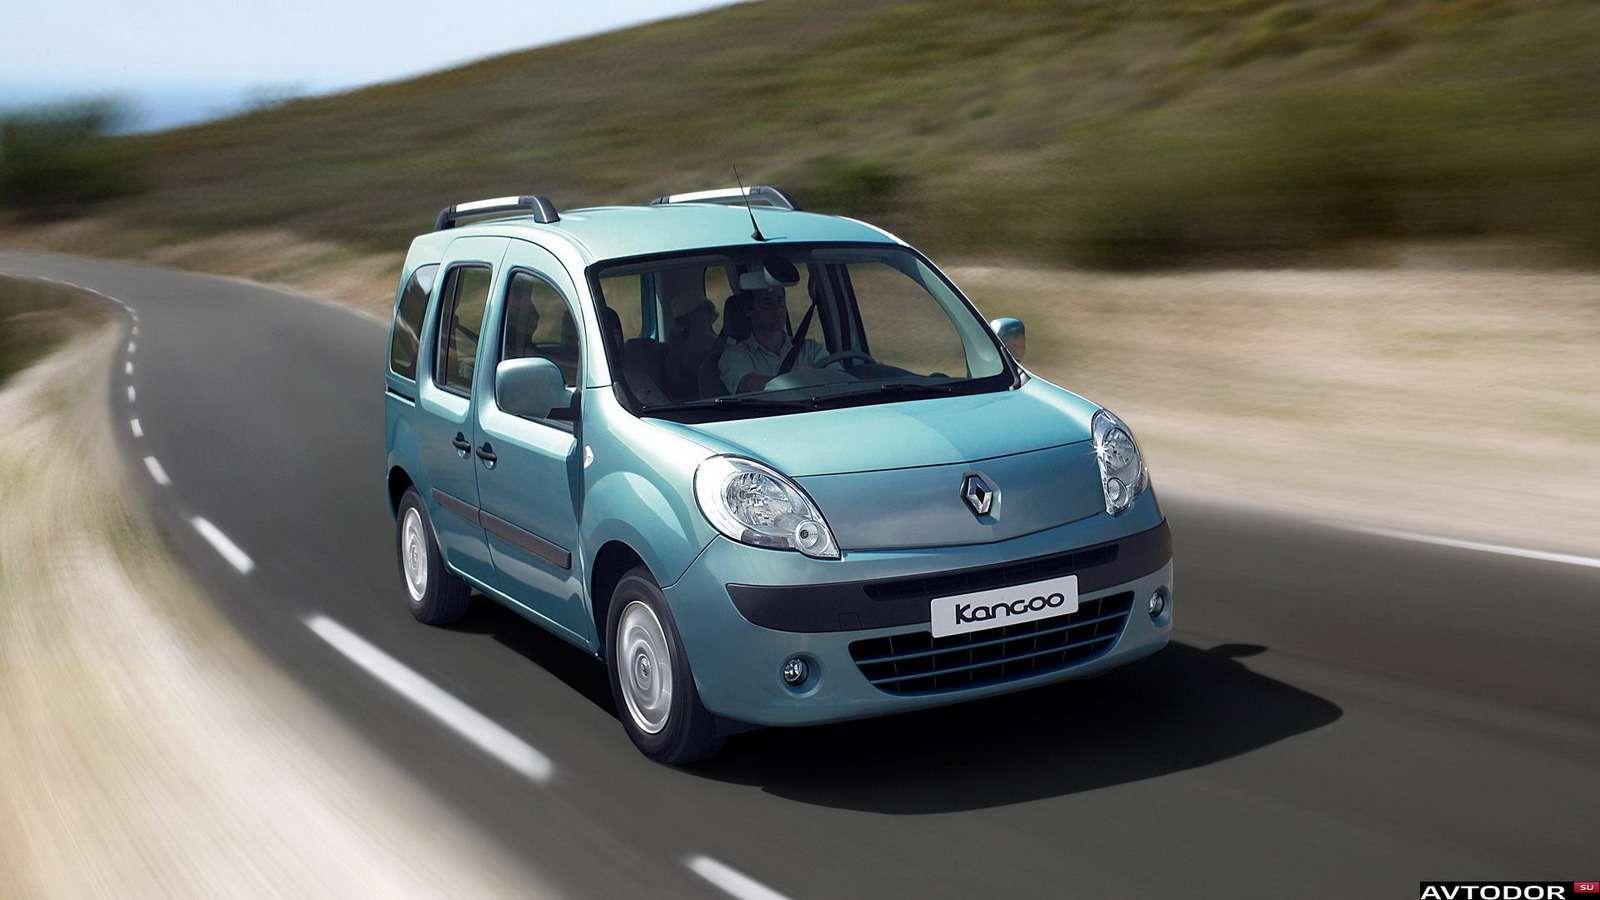 Renault-Kangoo-2007-1920x1080-001